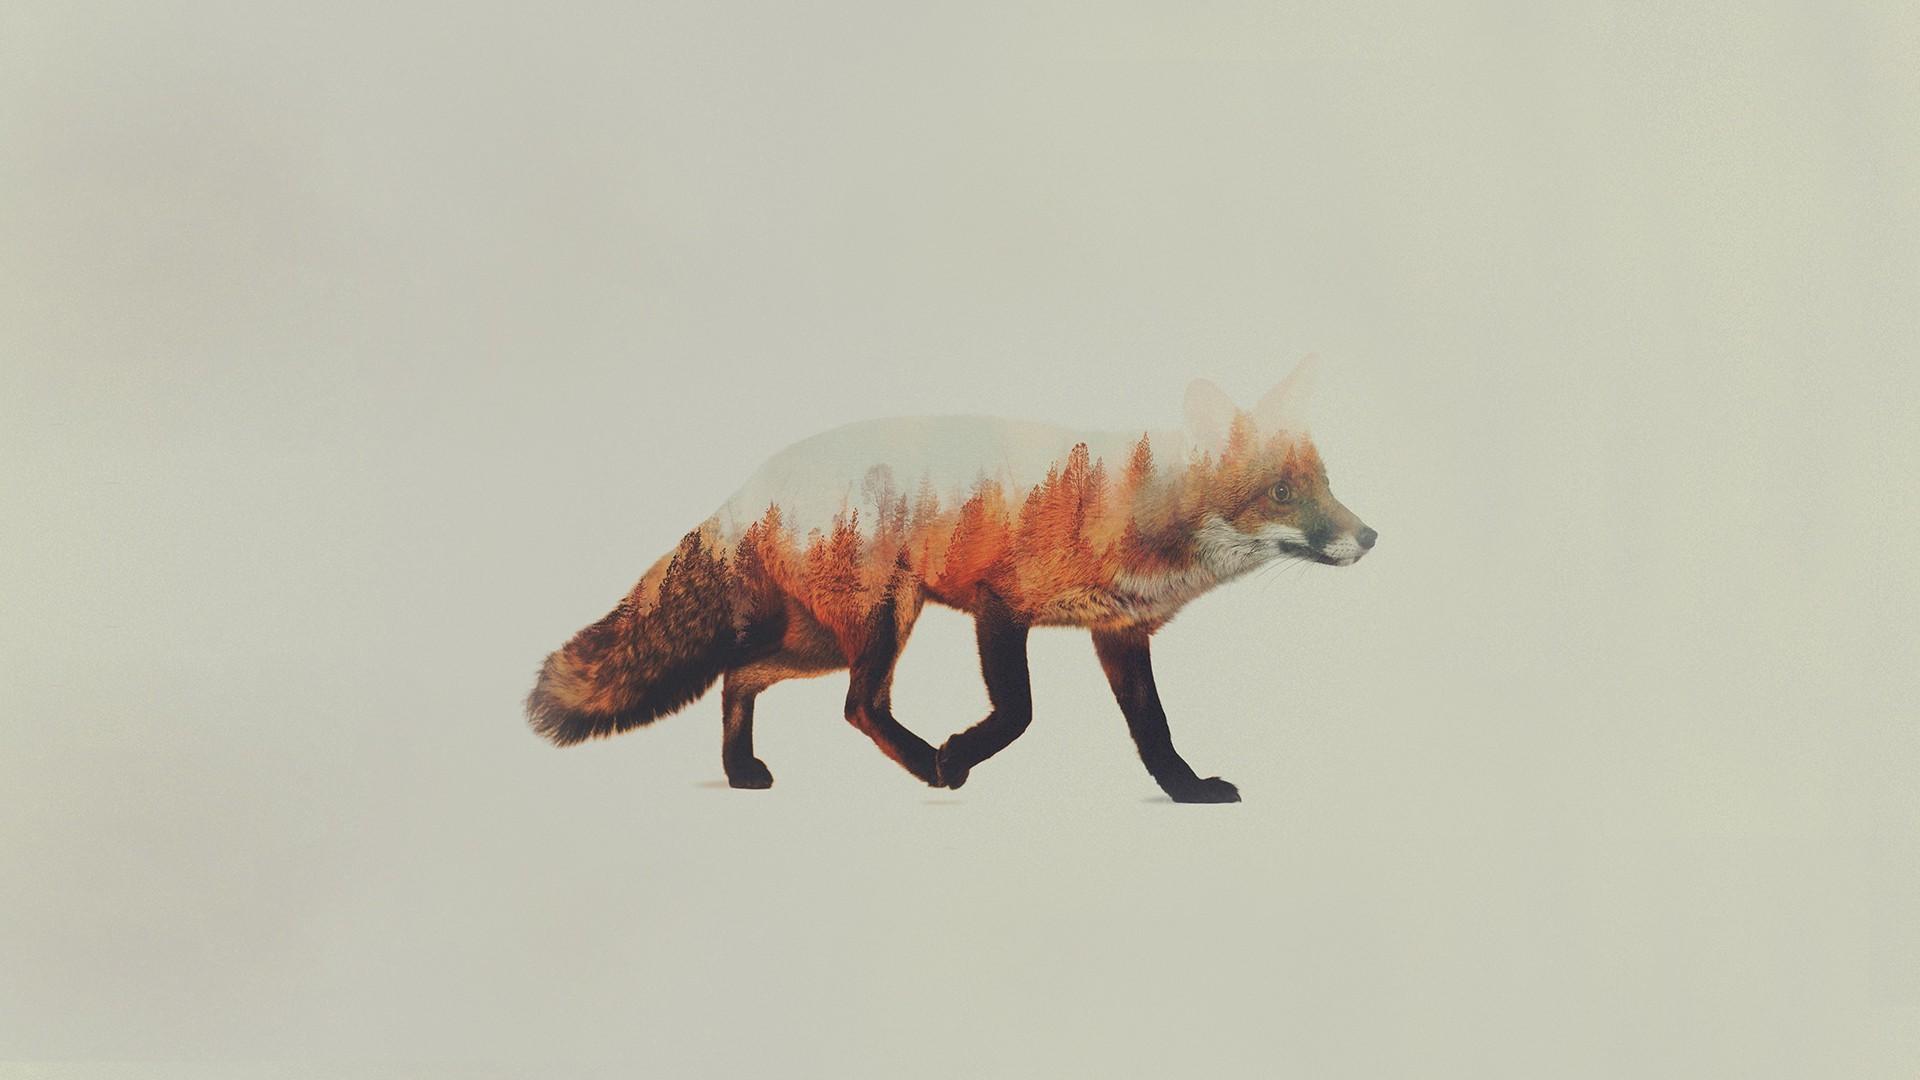 Arctic Fox Wallpaper Cute Aesthetic Fox Wallpaper 77 Images